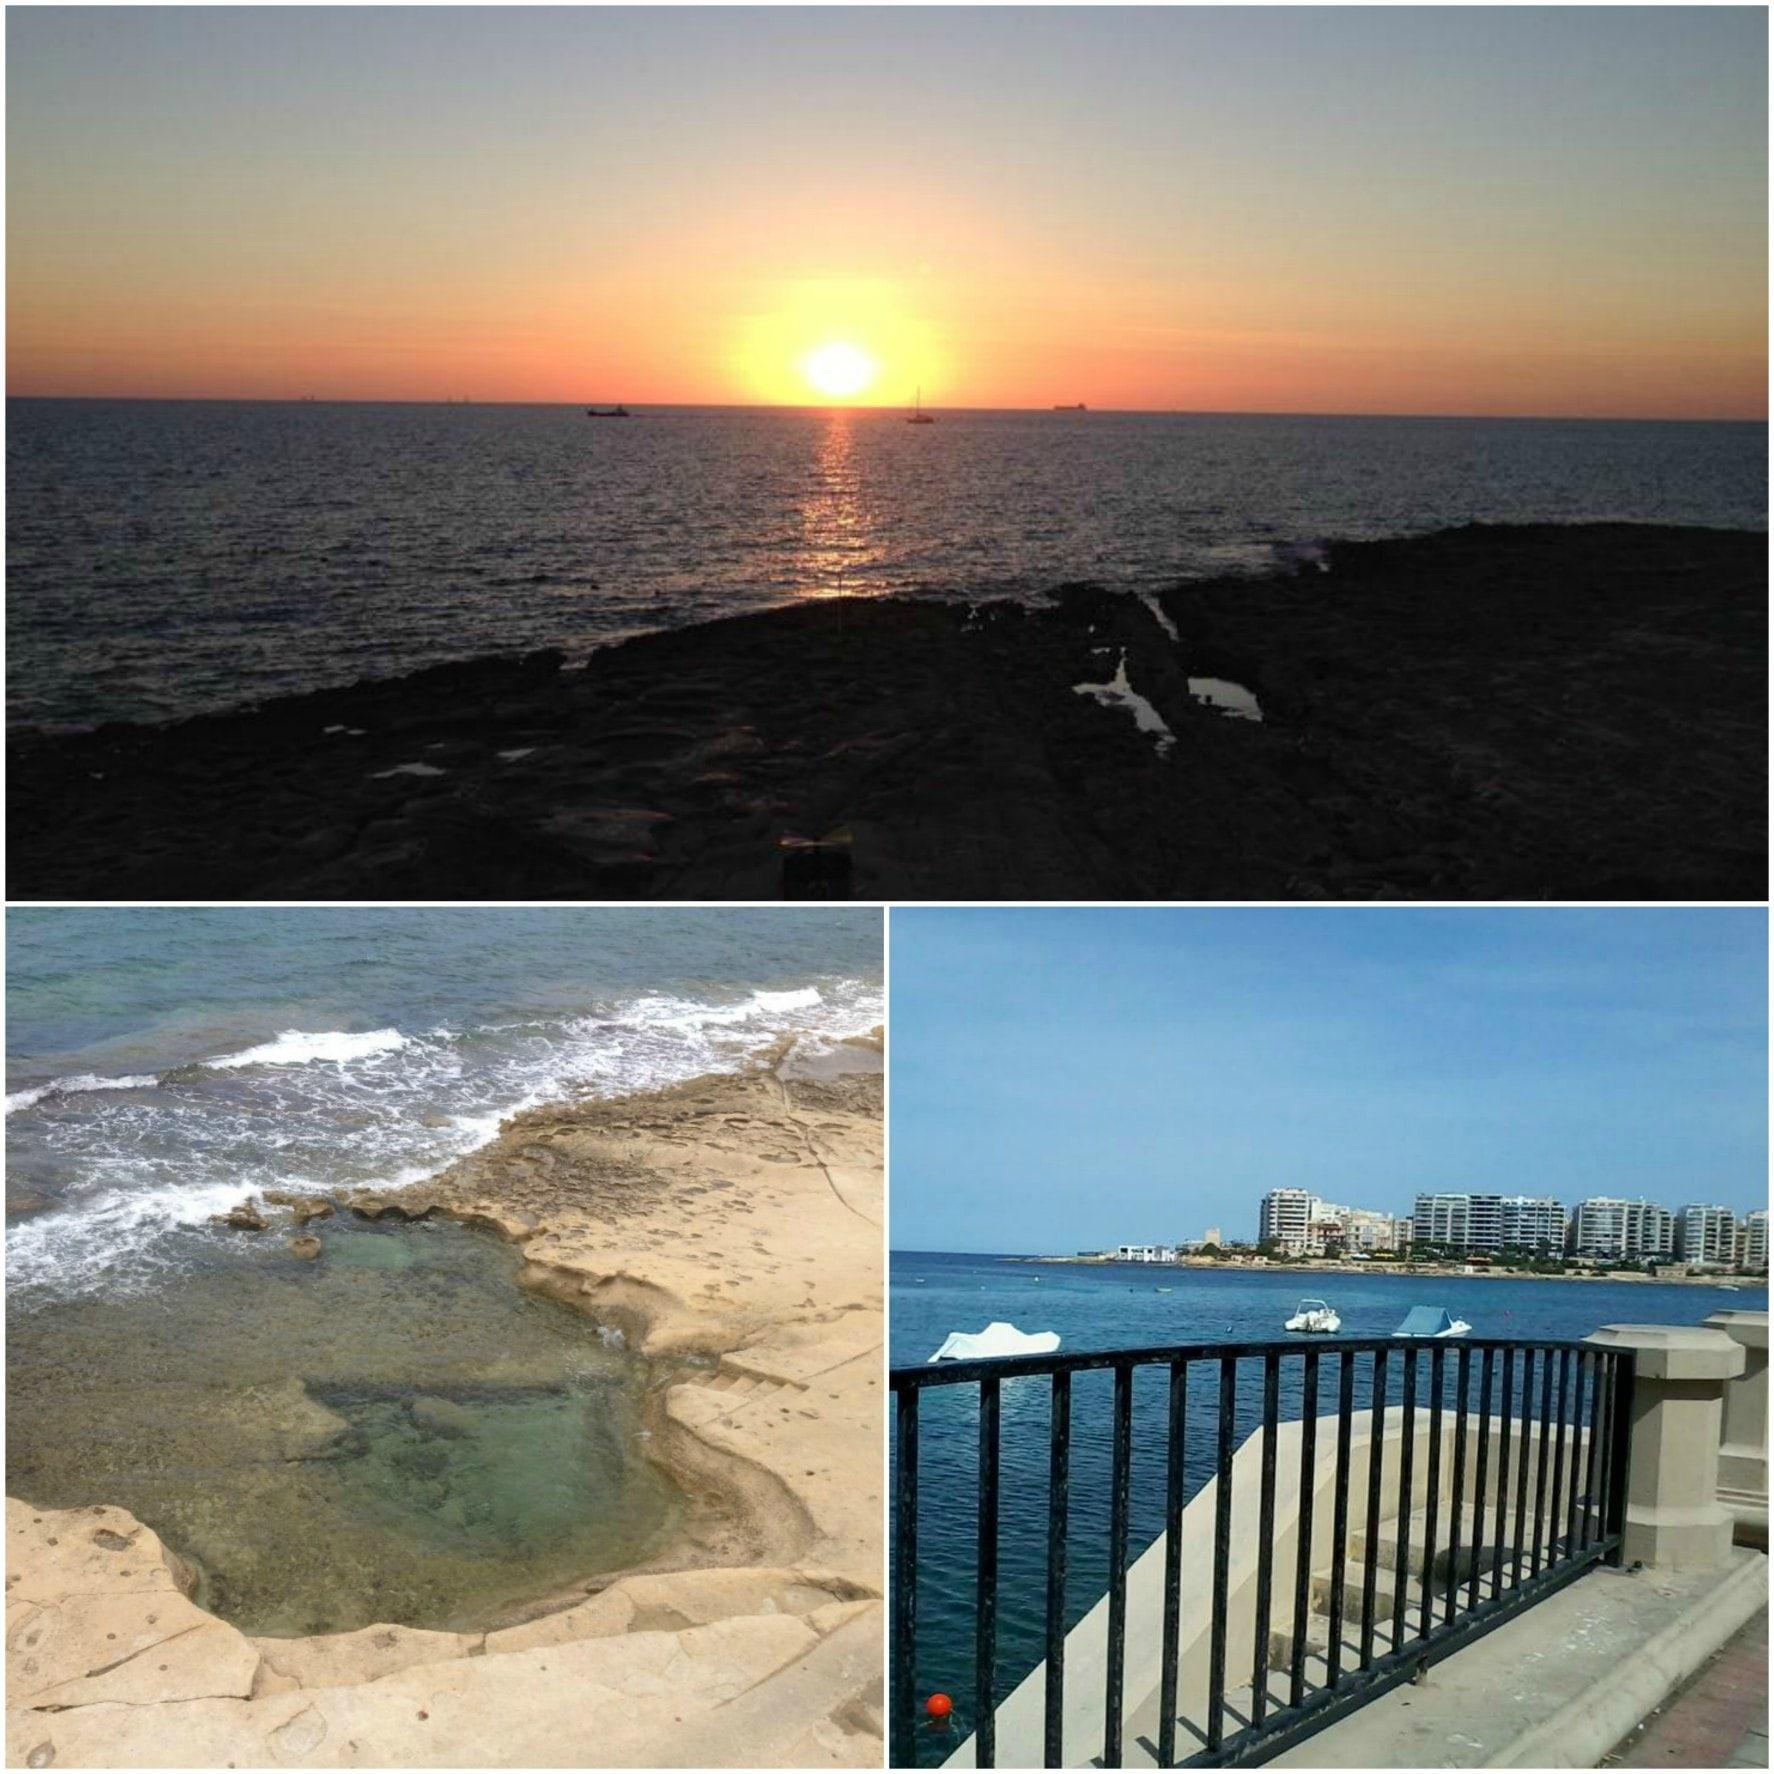 Sozinha em Malta | Sliema landscape